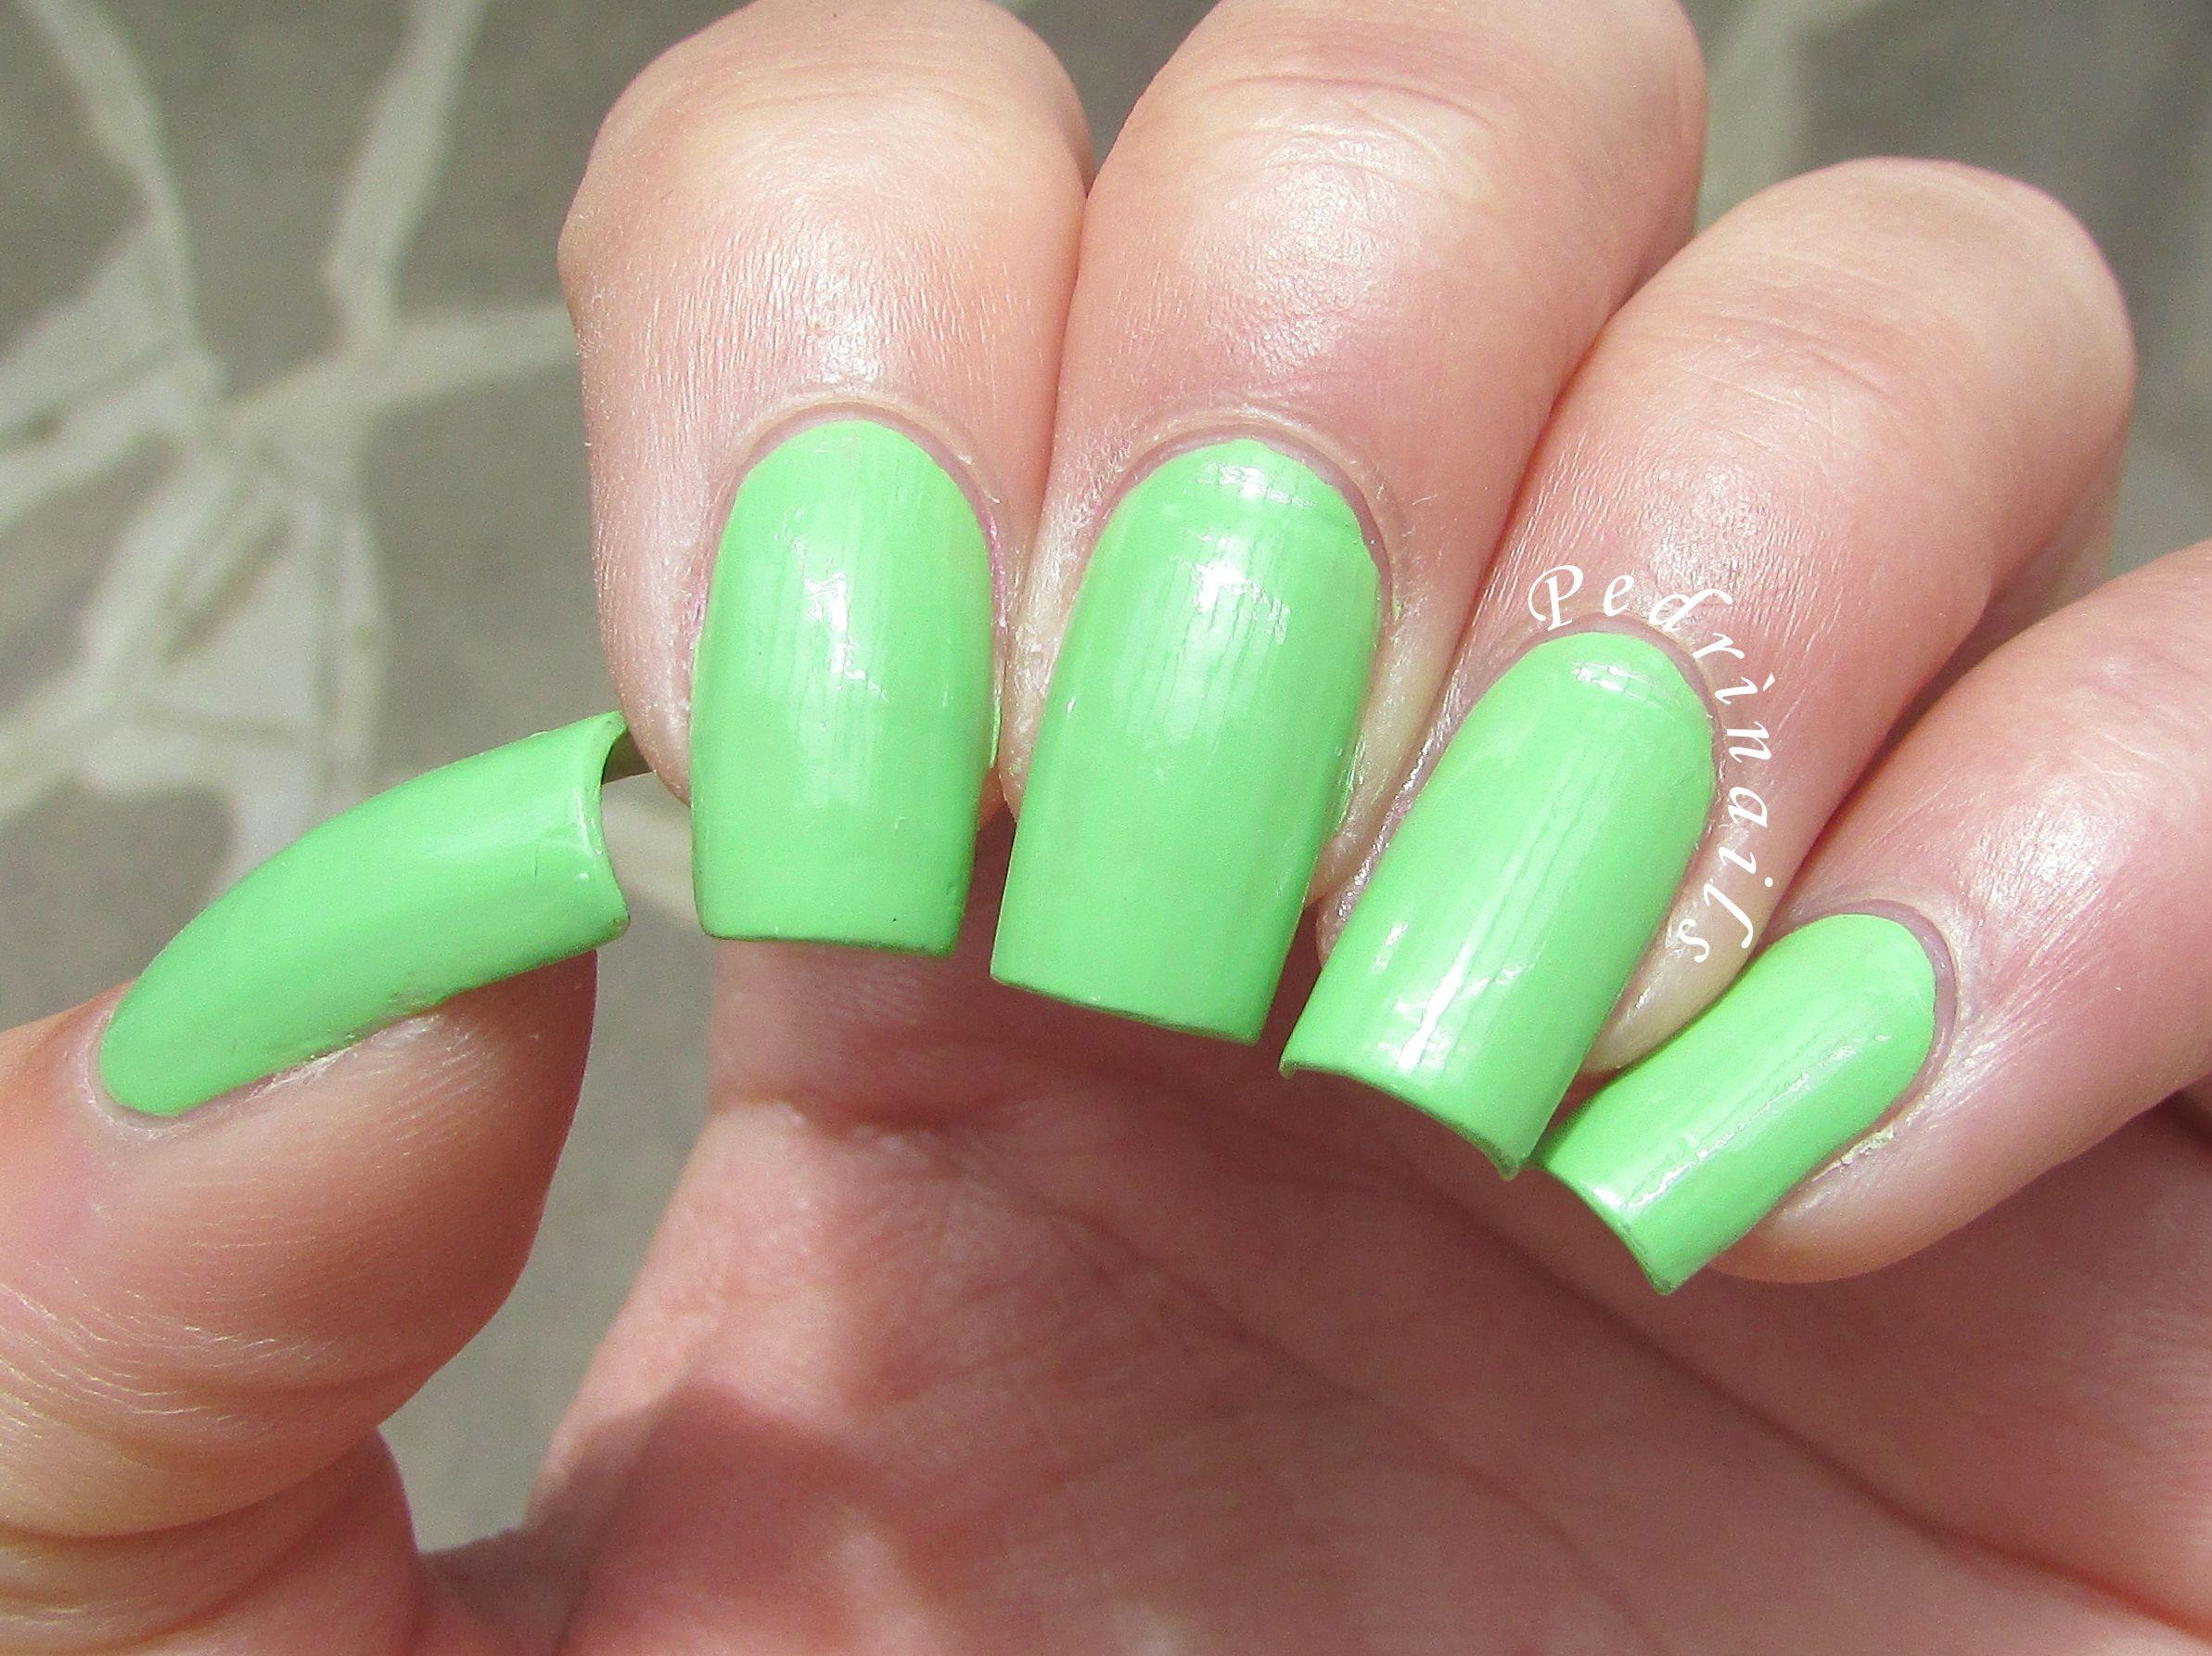 Swatch & review Essence the gel nail polish Brazil jungle 26 http://pedrinails.blogspot.it/2015/04/swatch-review-essence-gel-nail-polish.html